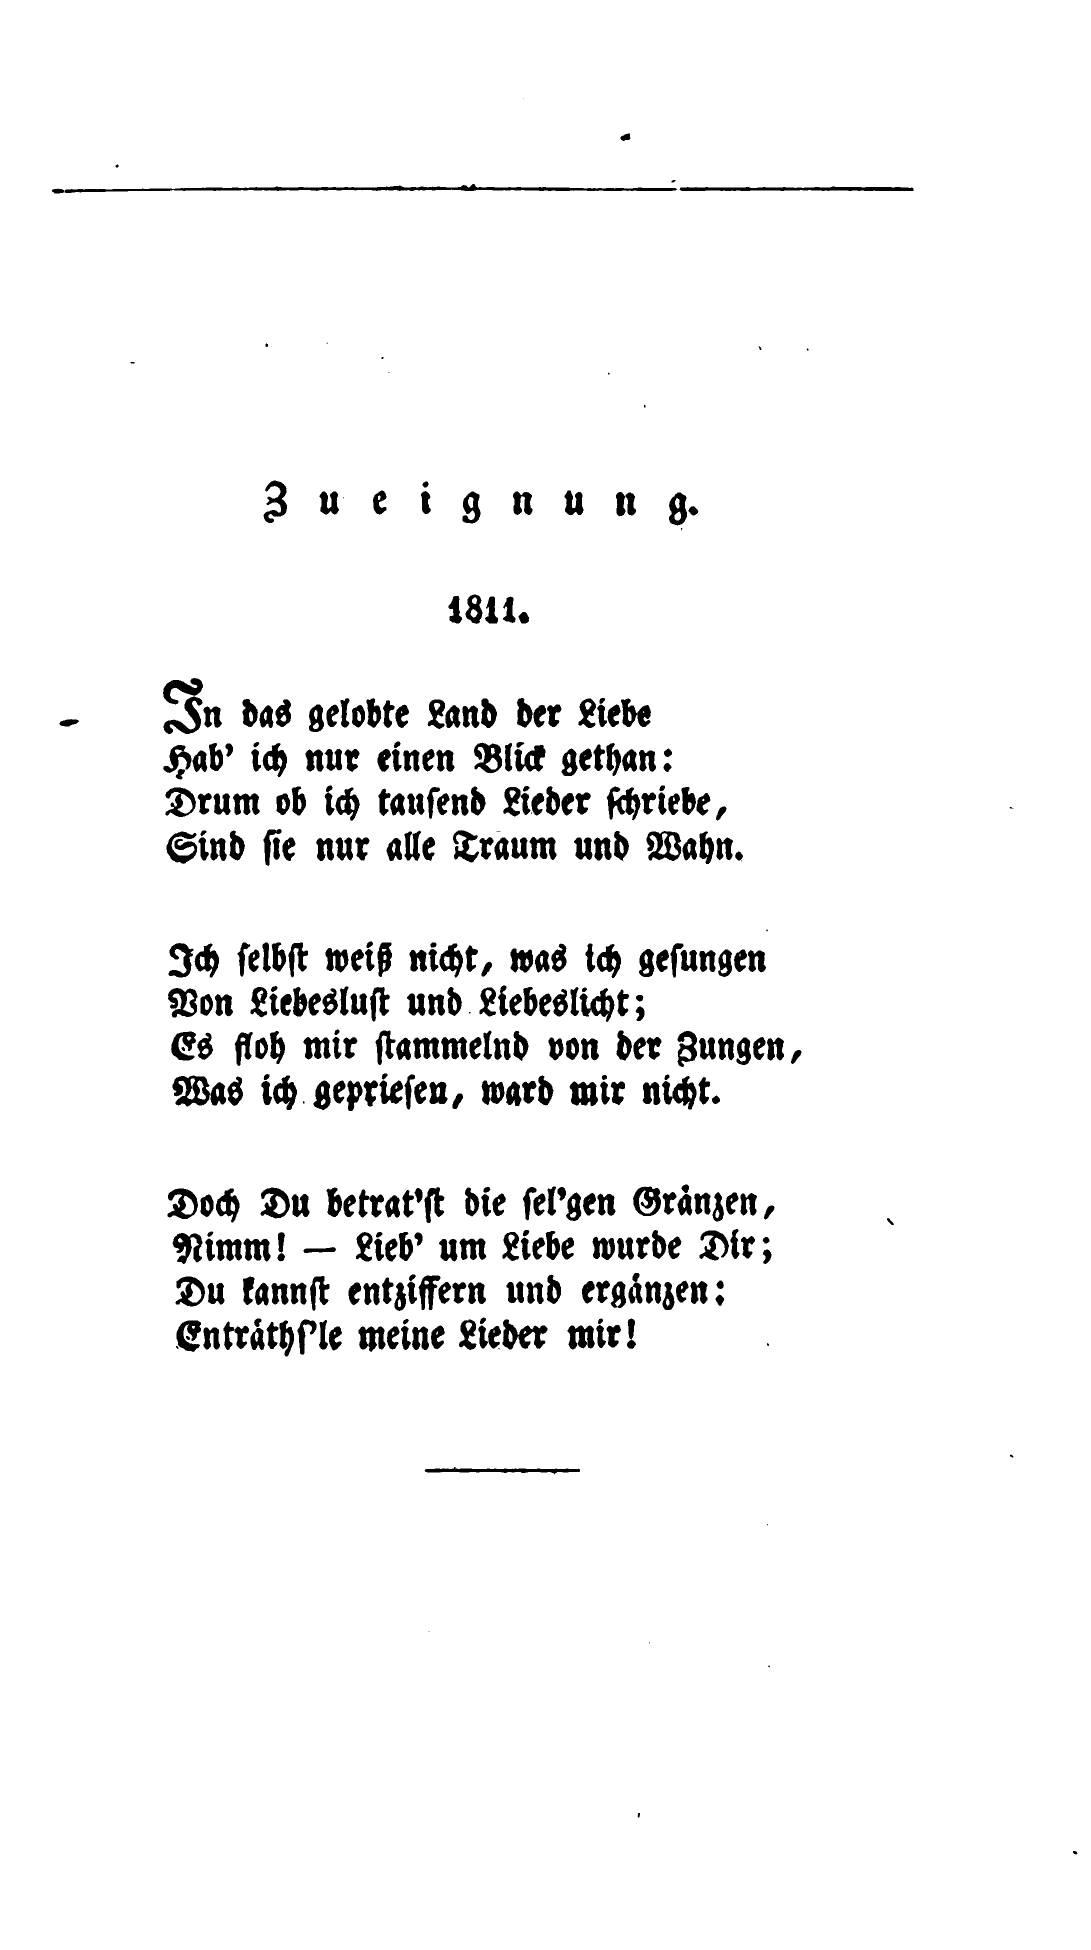 Filede Gedichte Schwab 1828 005jpg Wikimedia Commons